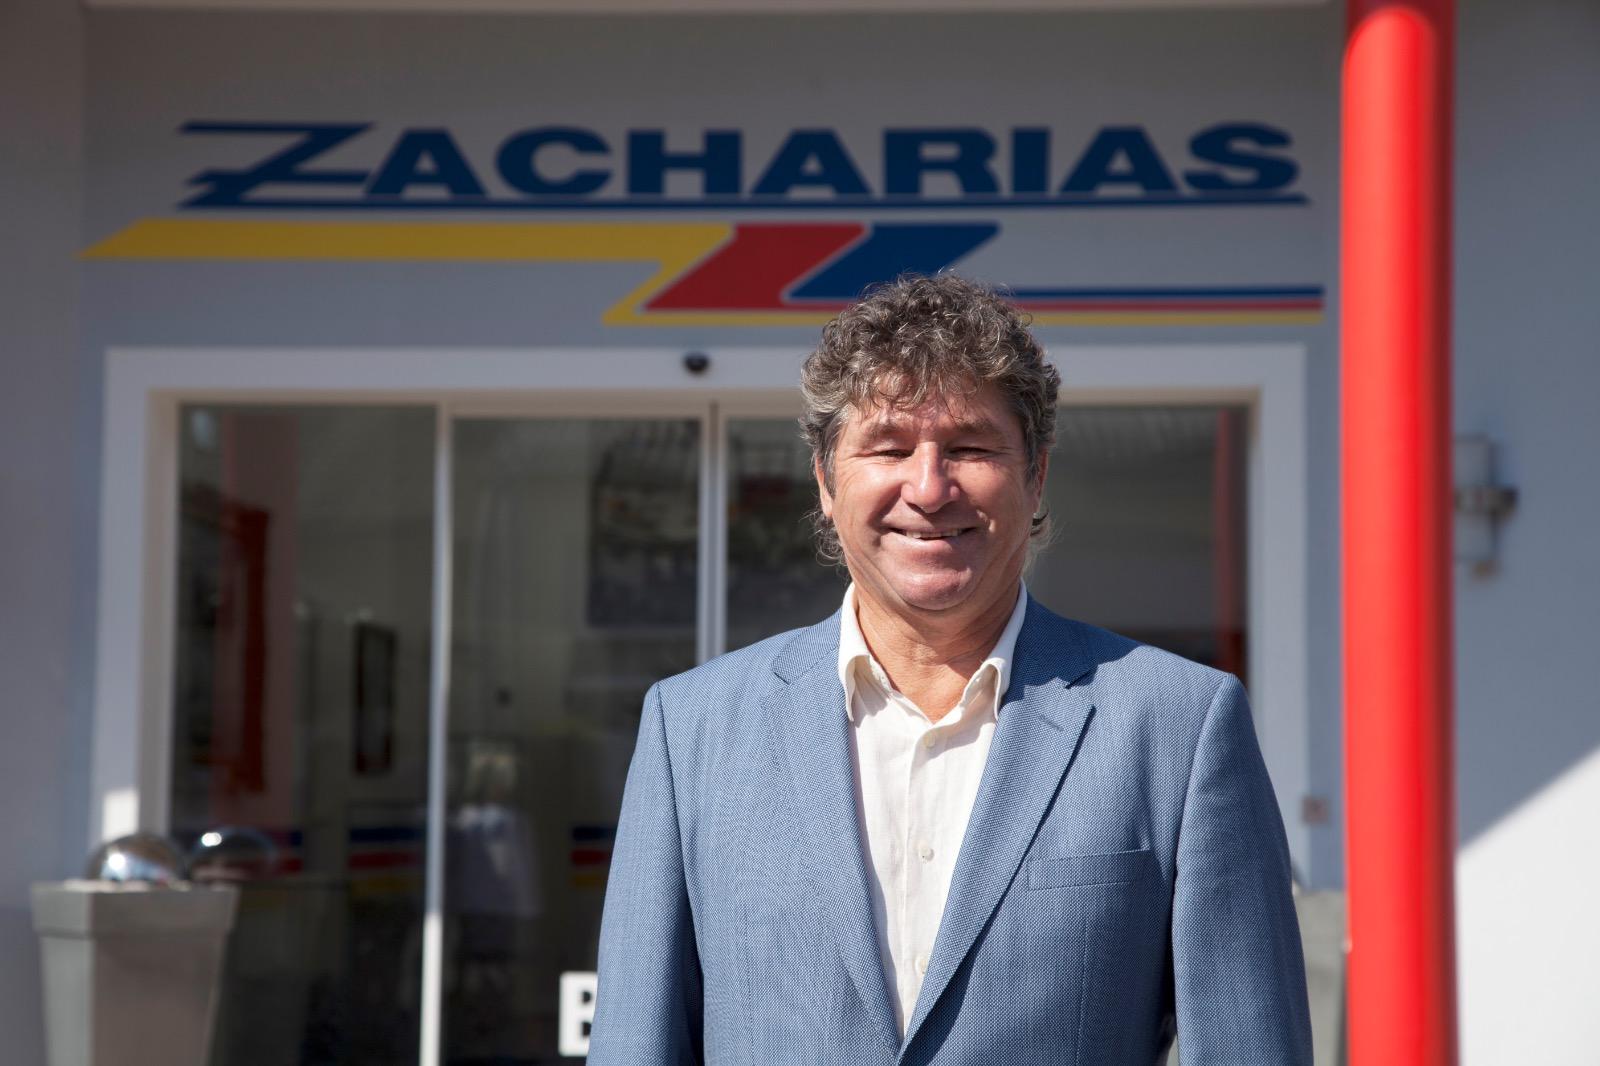 Fritz Zacharias